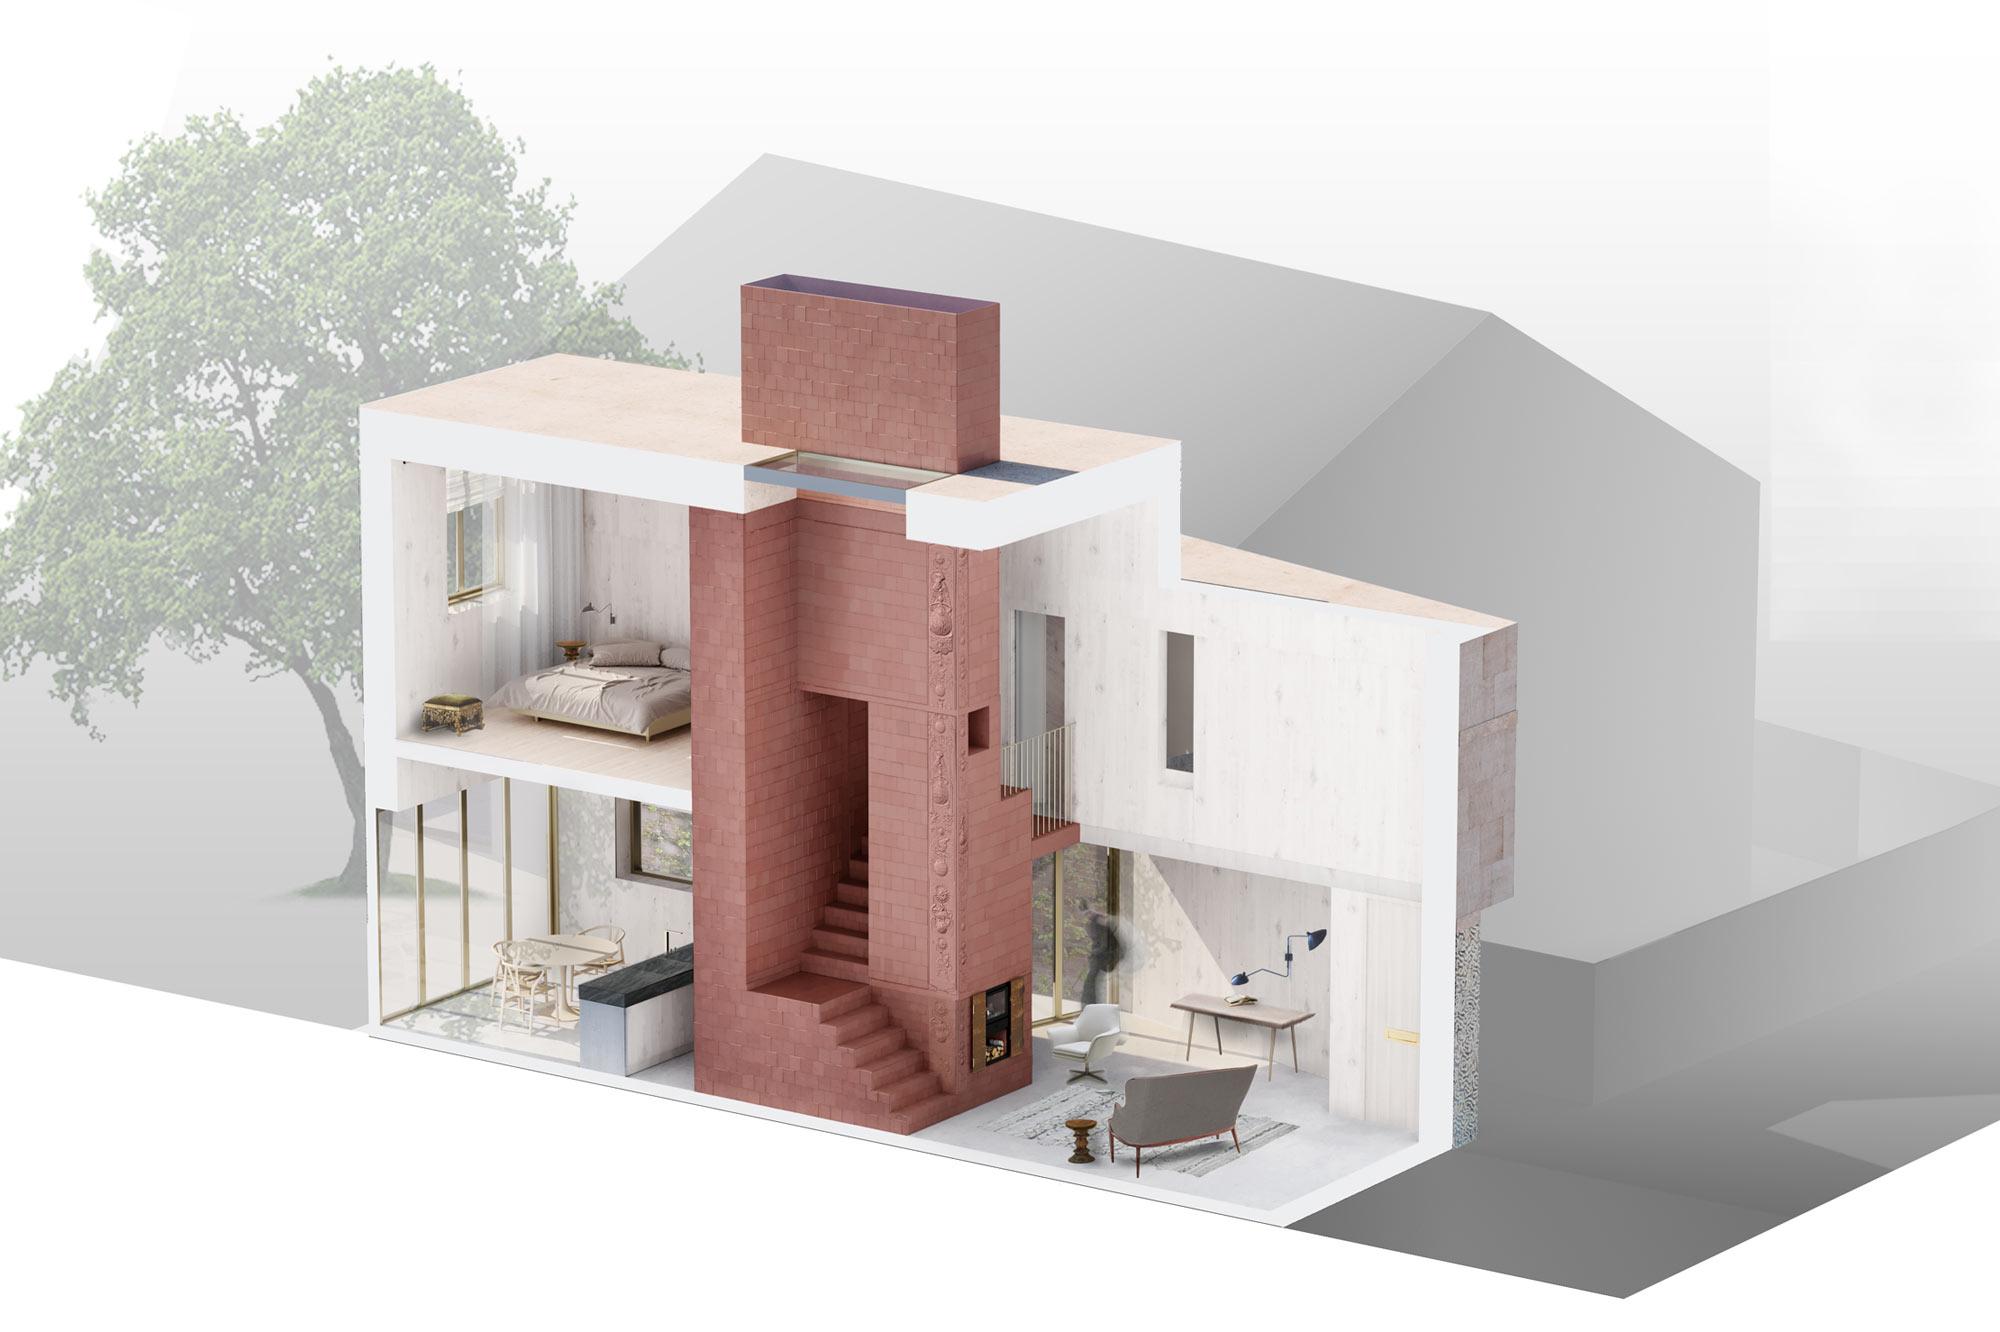 cube-haus-skene-catling-architects-cs-2000×1332-04